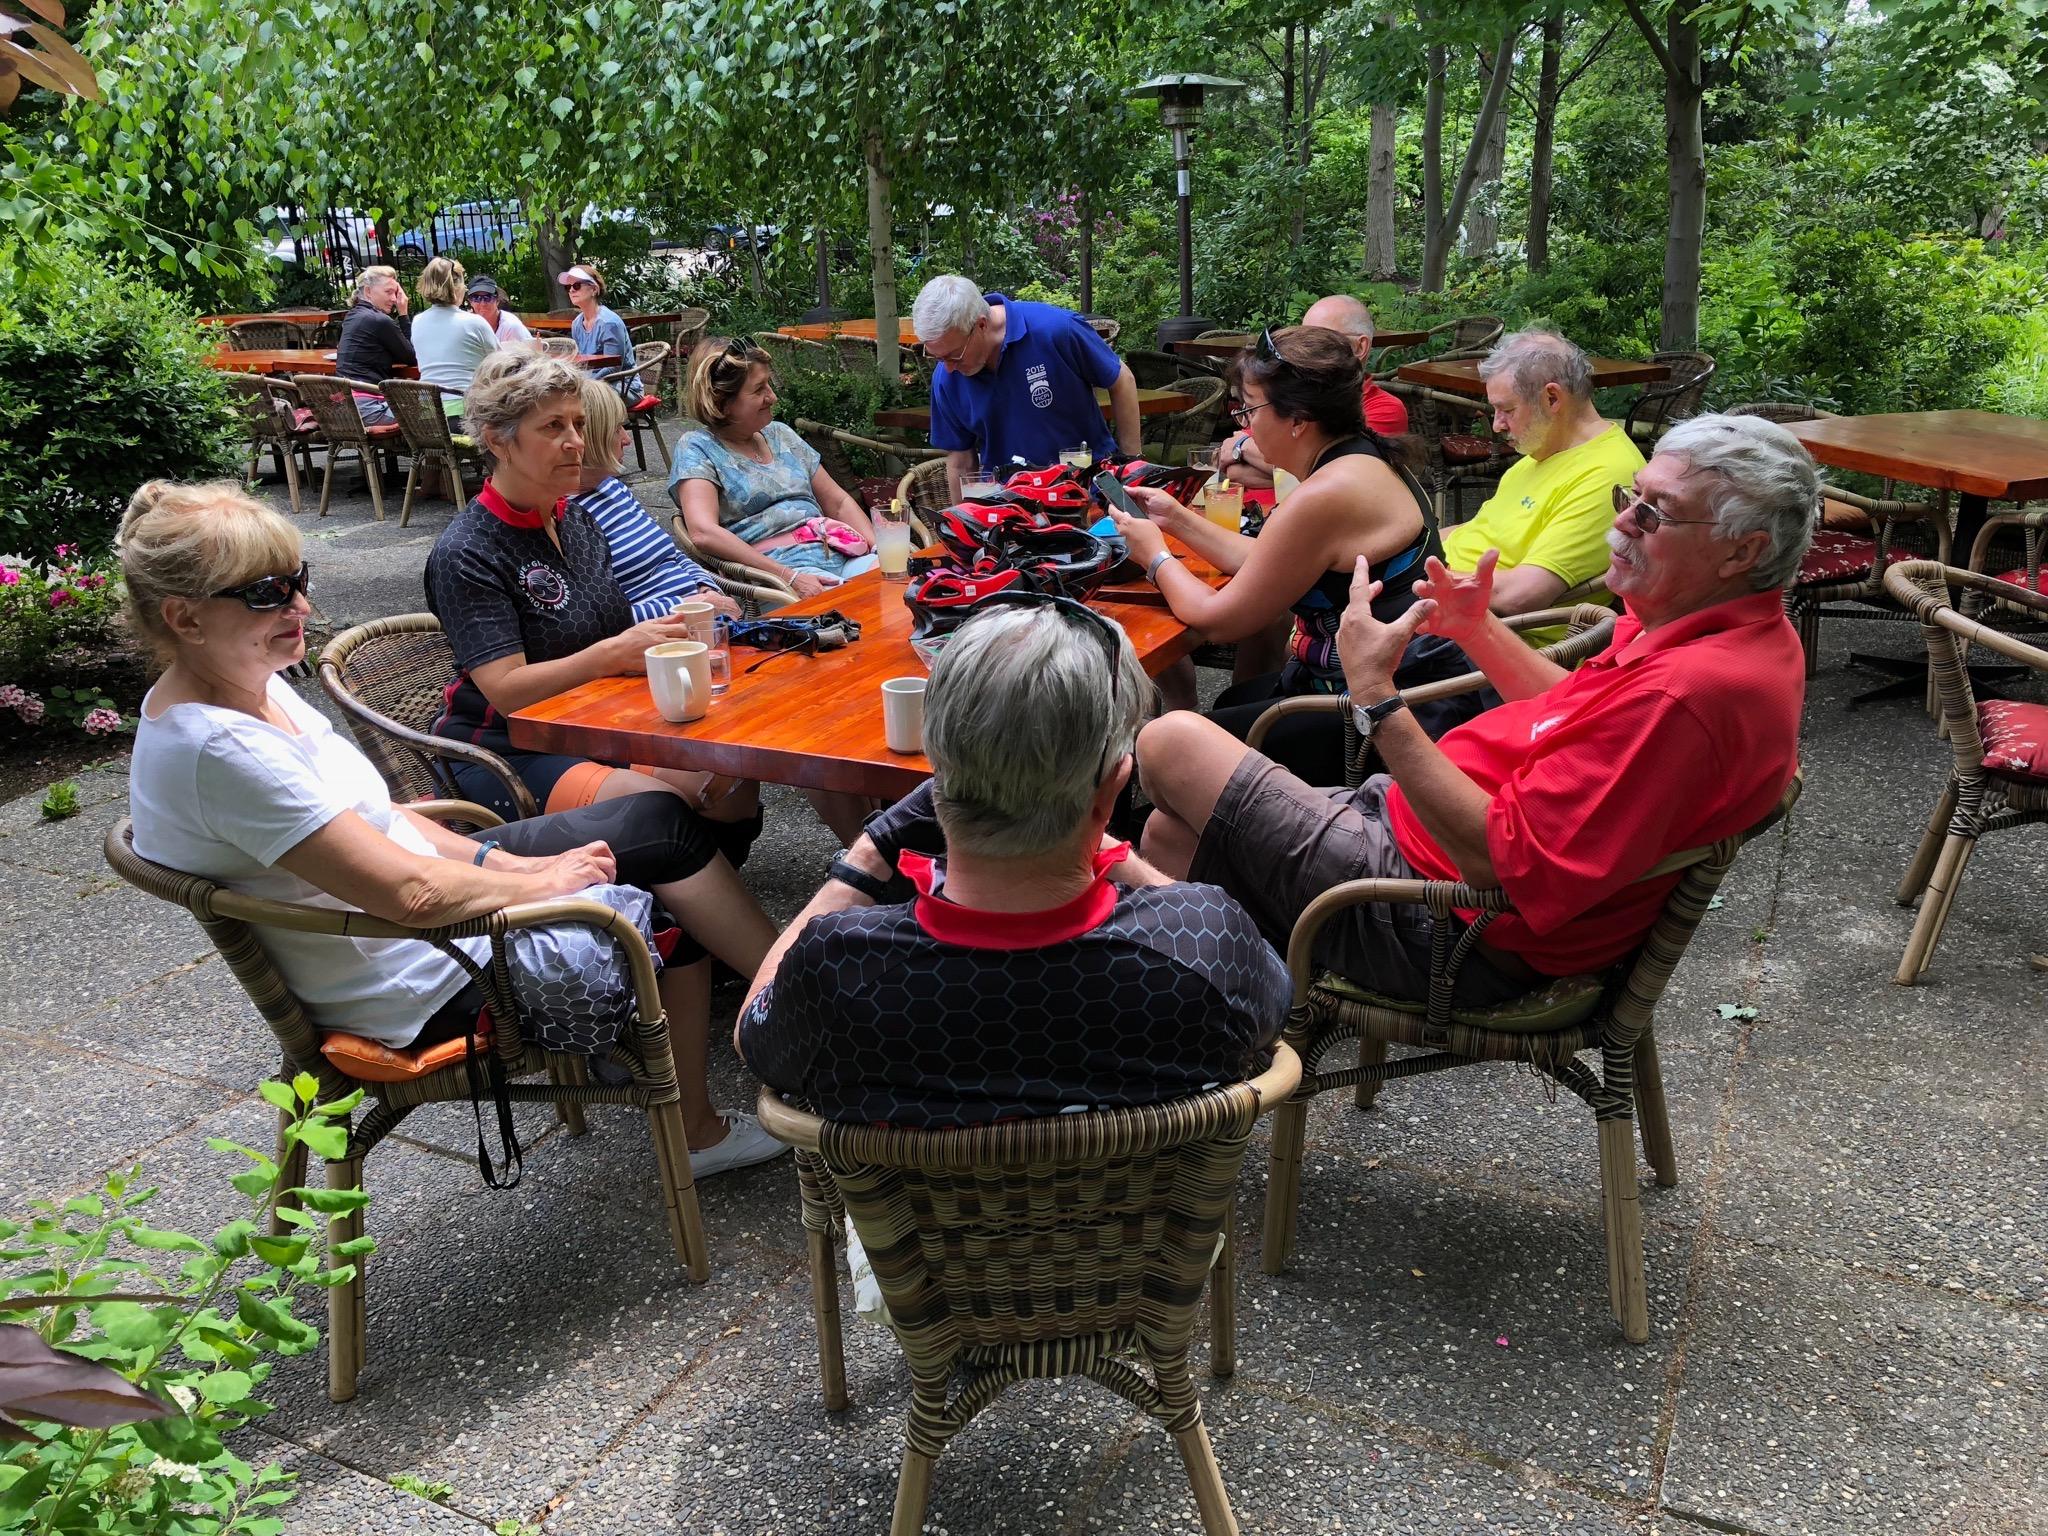 Our morning break in beautiful Linden Gardens